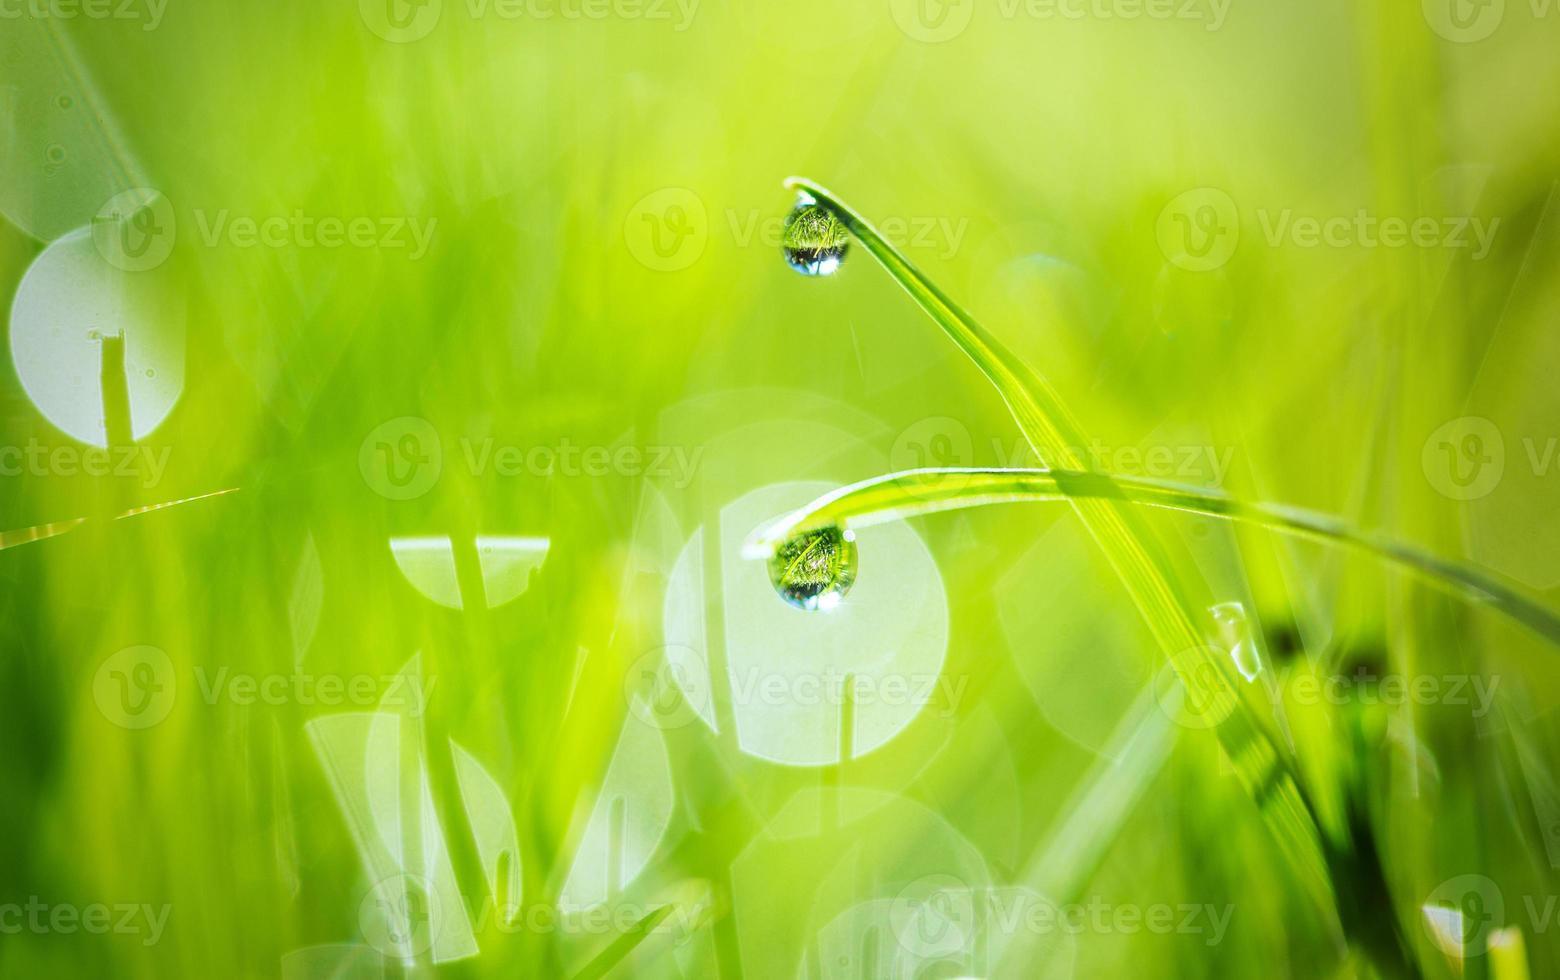 waterdruppels op gras foto